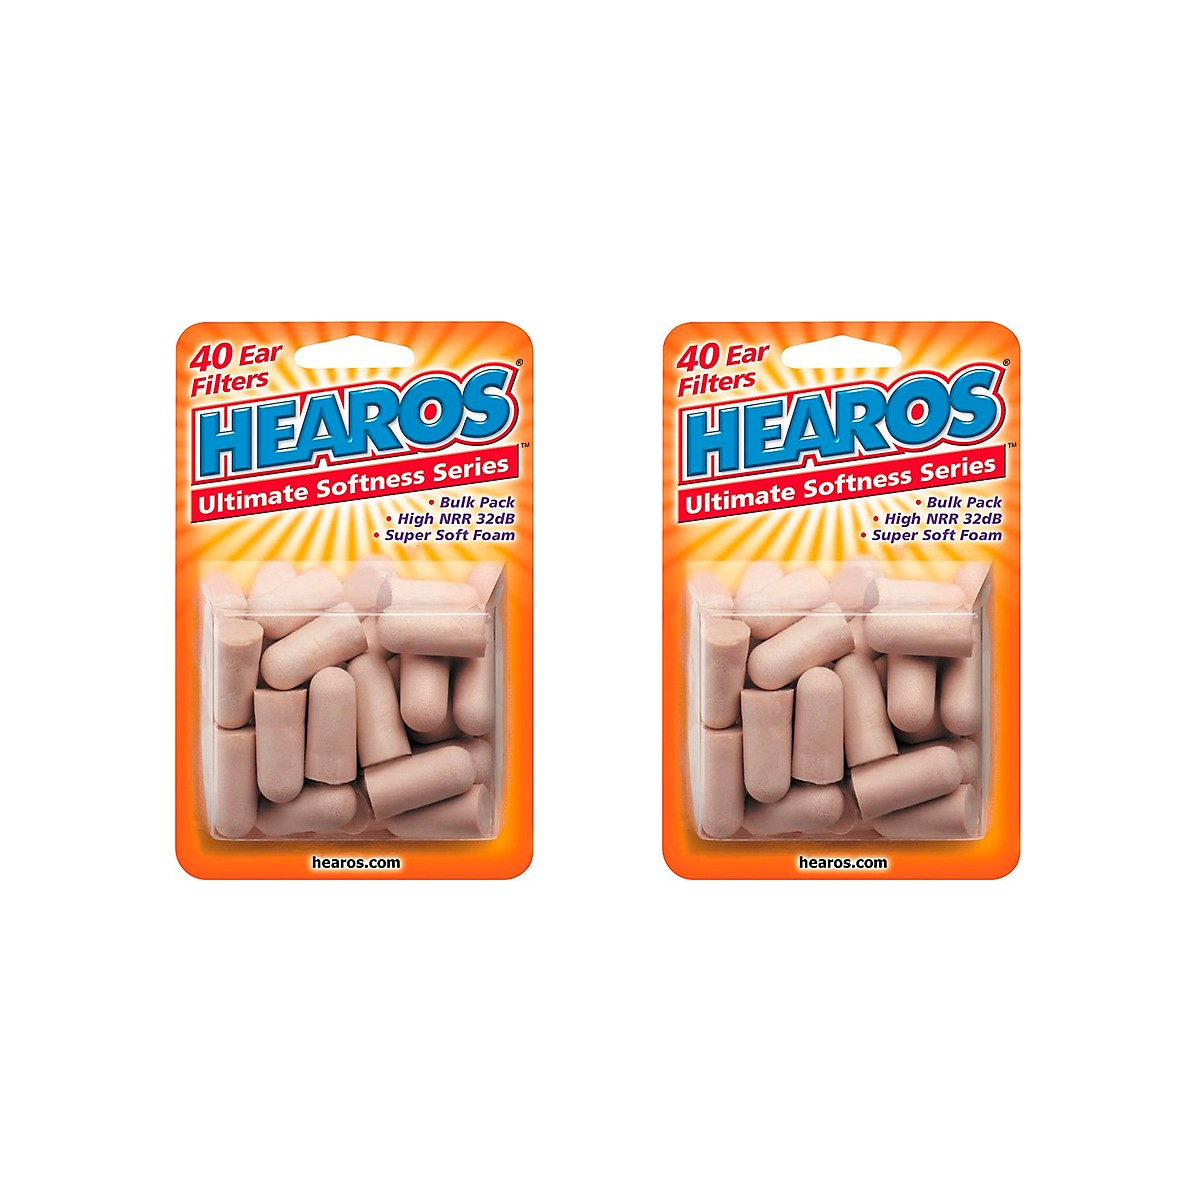 Hearos Ultimate Softness Bulk Pack Ear Plugs 20 Pair (Pack of 2)